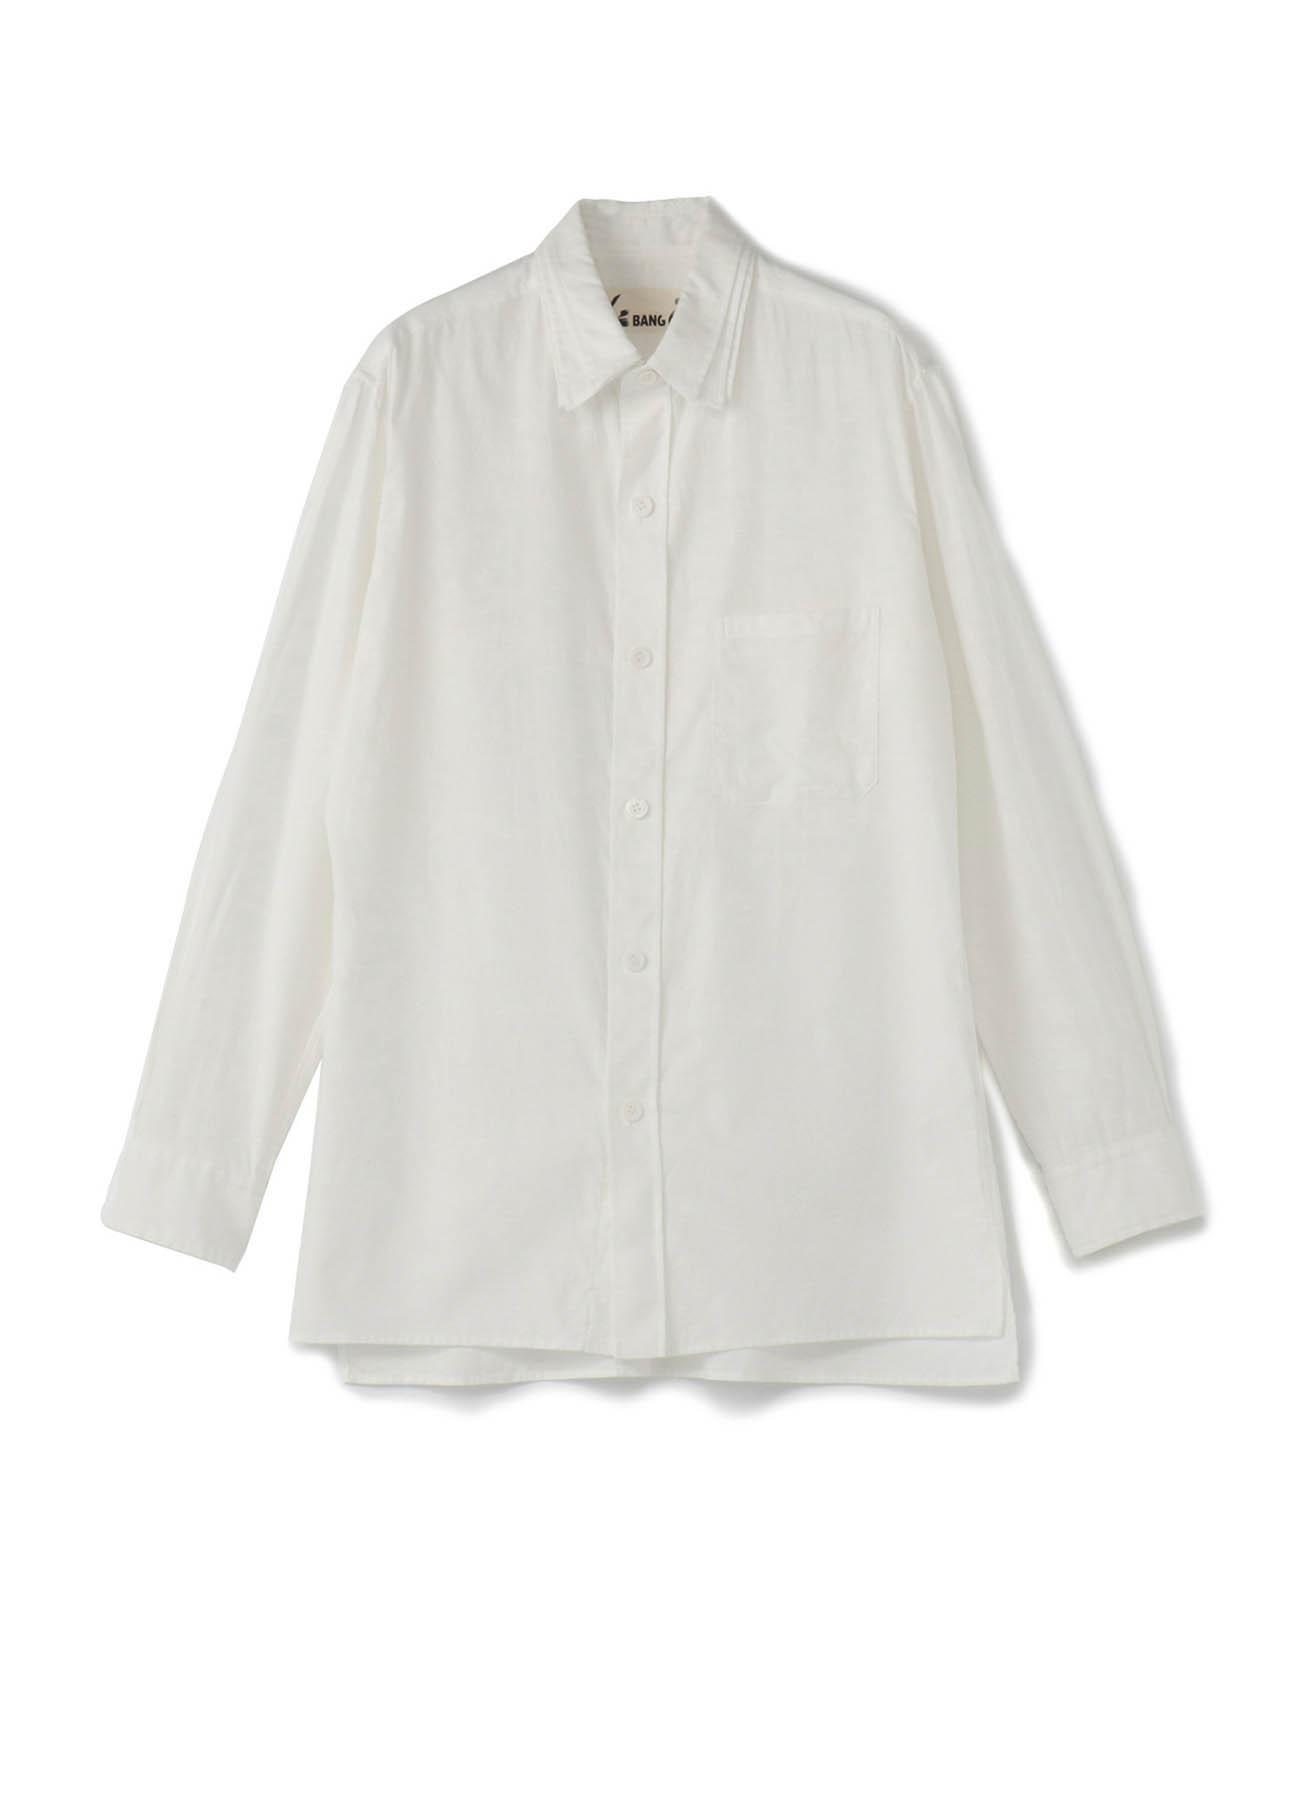 No.2 3 Layered Collar Shirt Cotton Twill - Thin